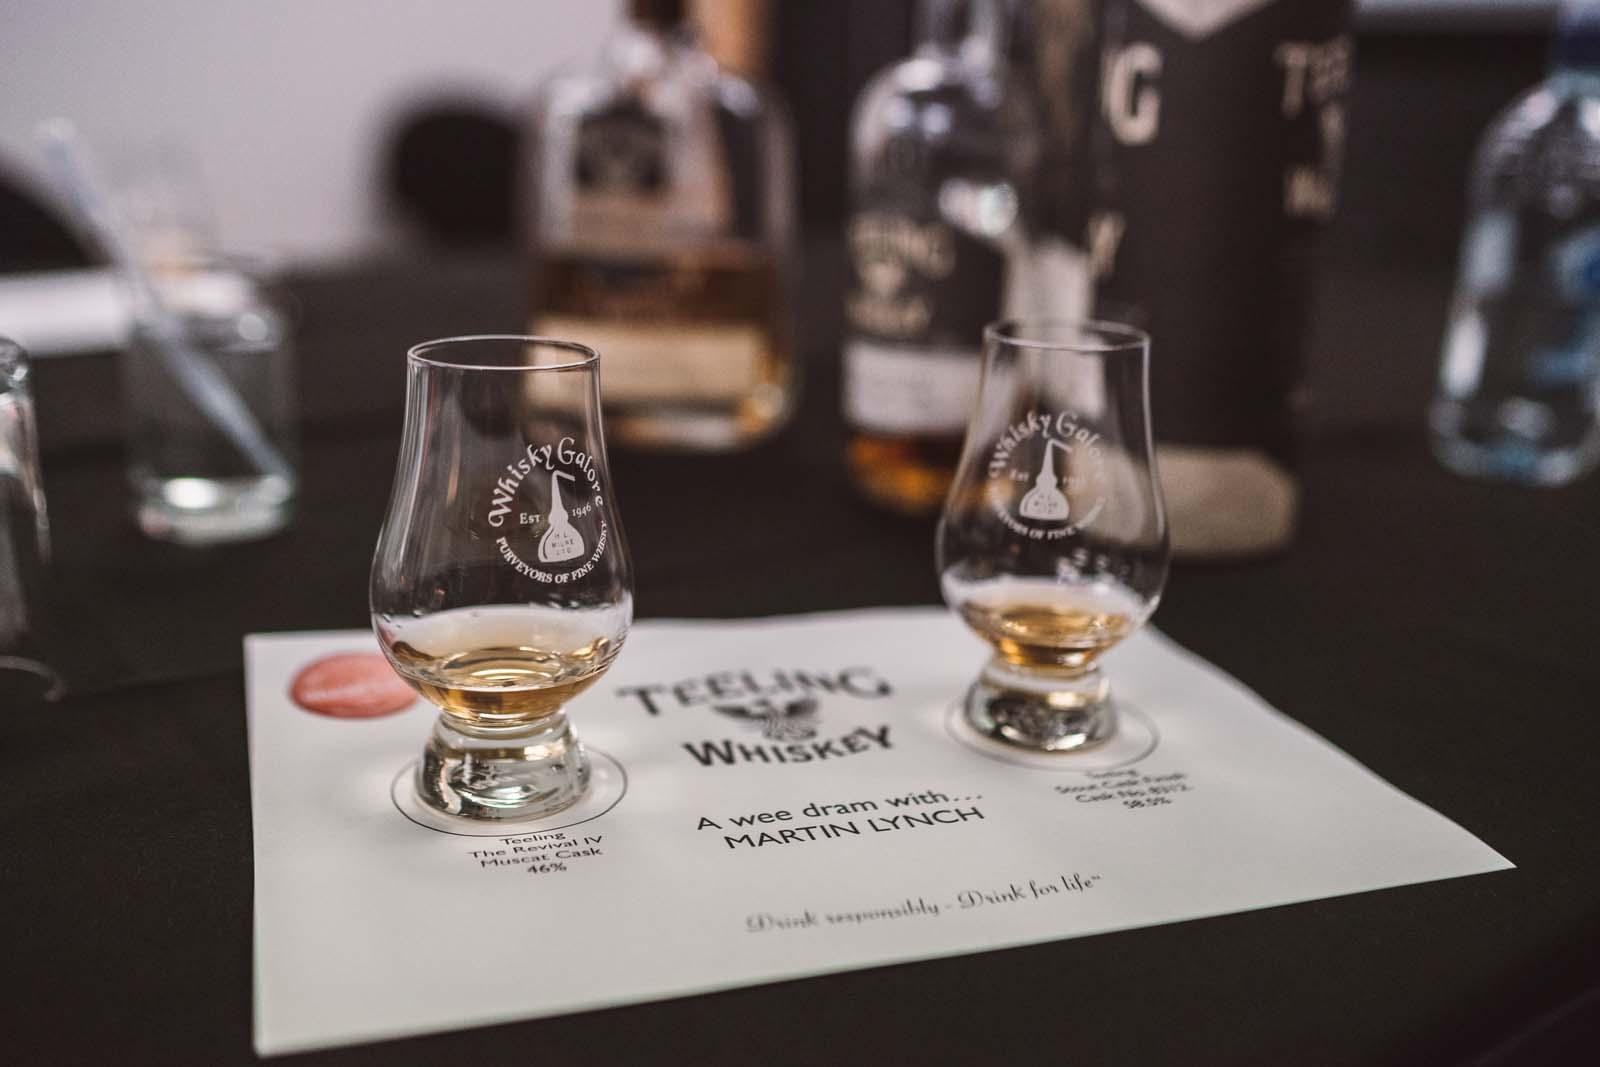 Dramfest 2018 for Whisky Galore-251.jpg